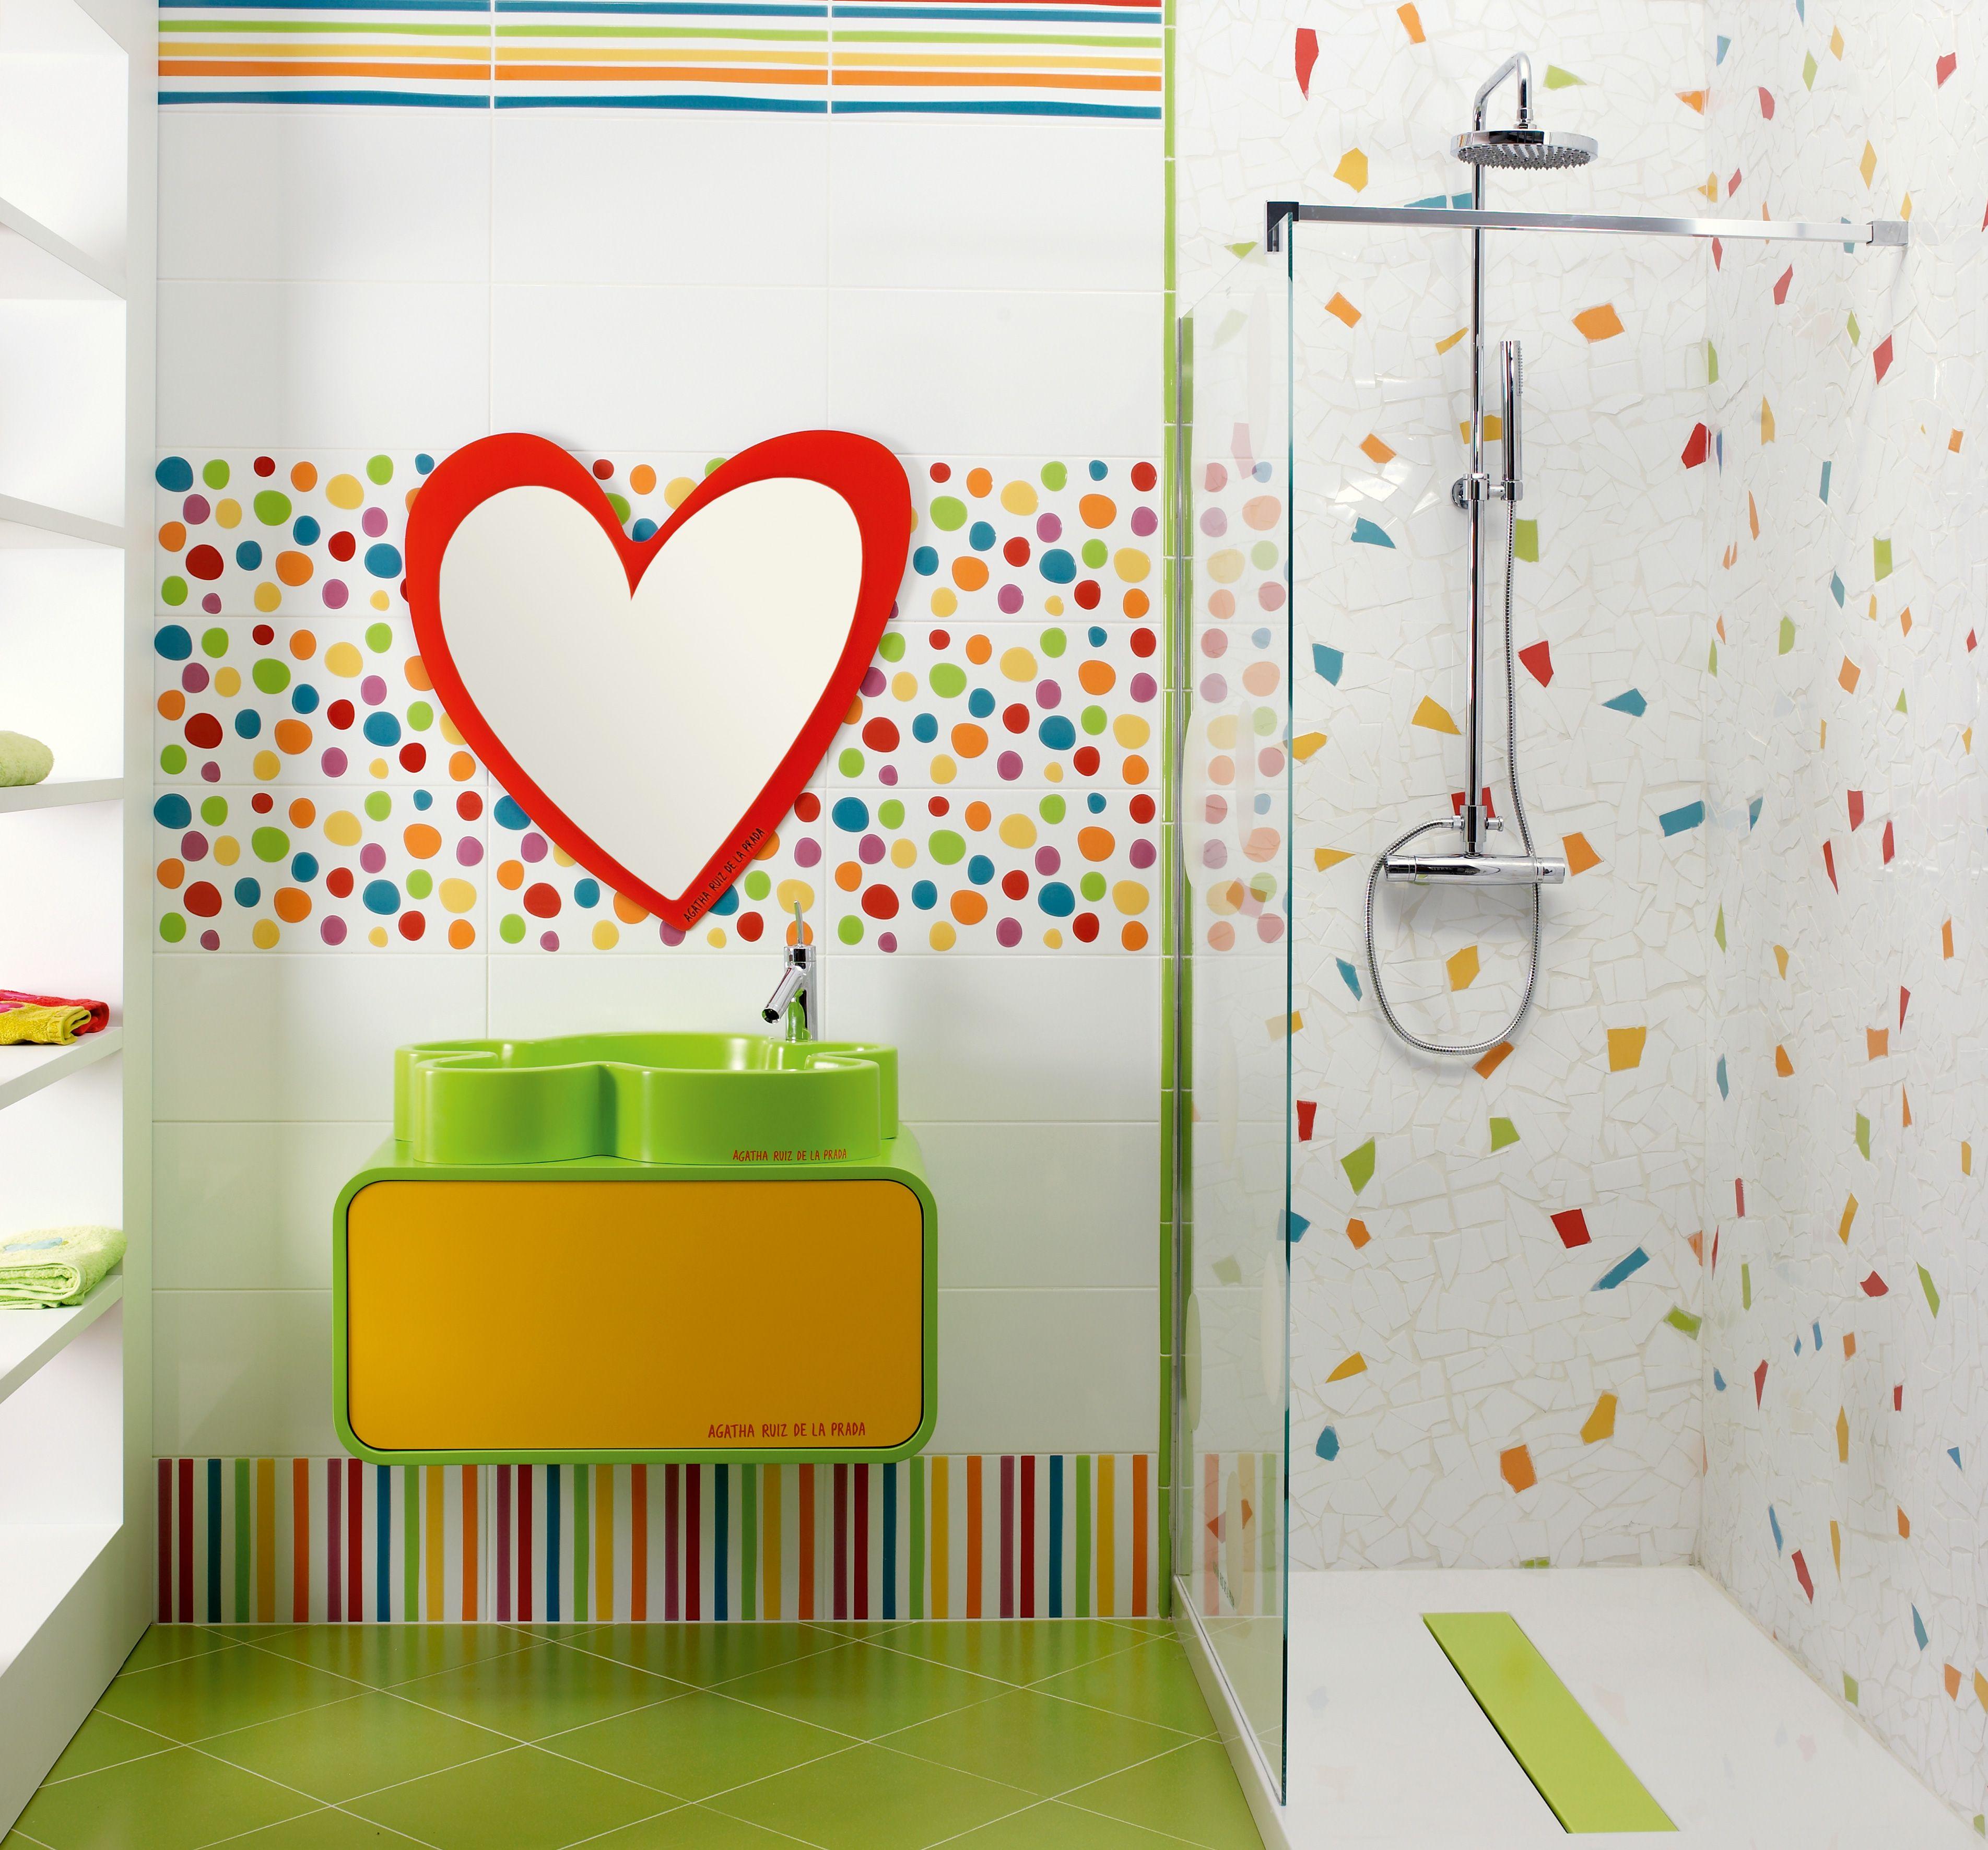 baño agatha ruiz dela prada - buscar con google | baños ... - Azulejos Bano Agatha Ruiz Dela Prada